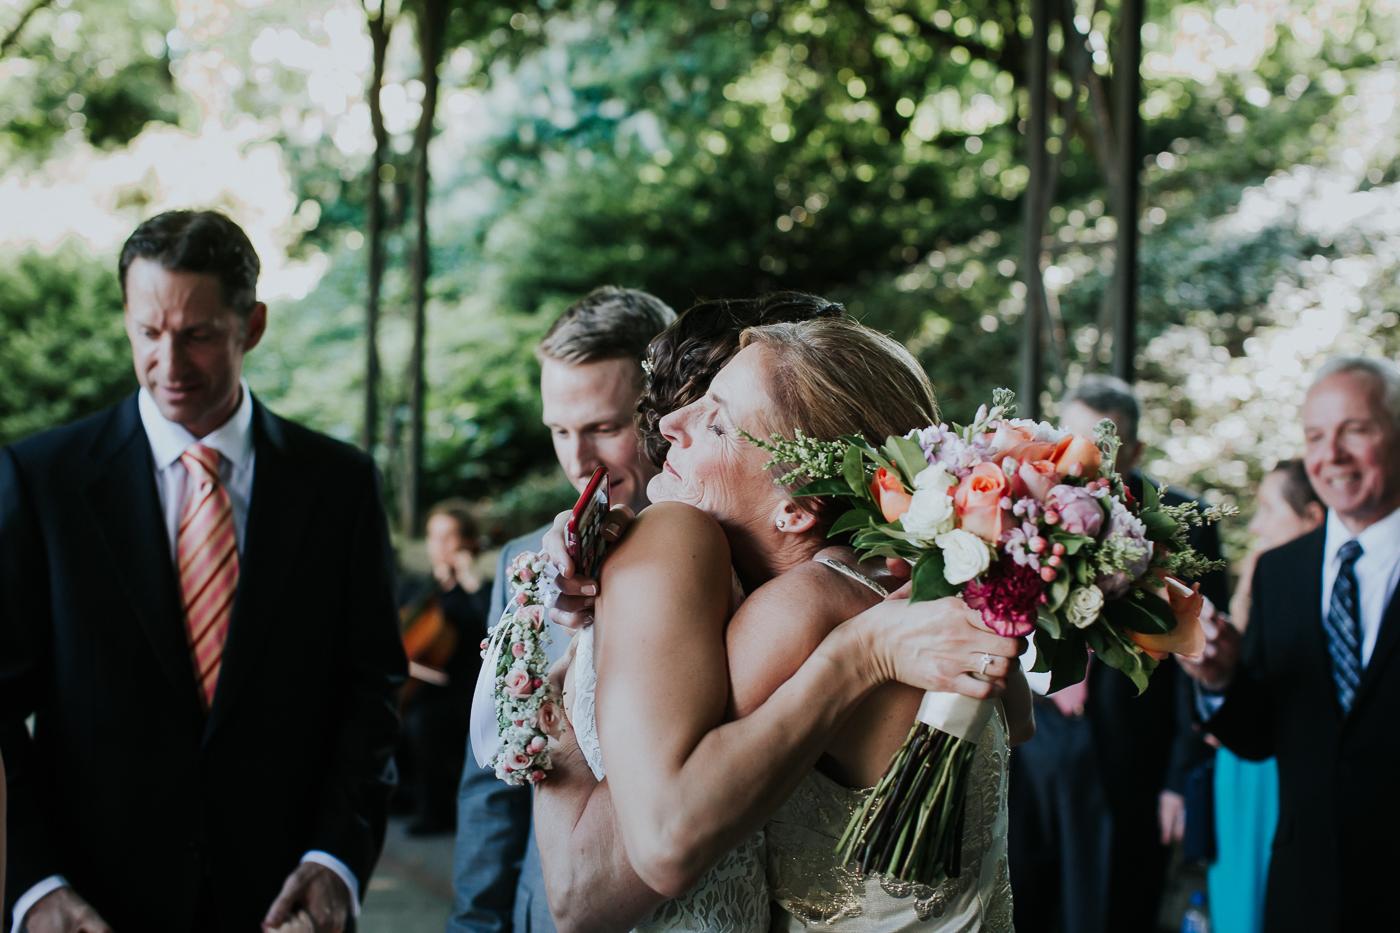 NYC-Central-Park-Conservatory-Garden-Intimate-Elopement-Documentary-Wedding-Photographer-32.jpg